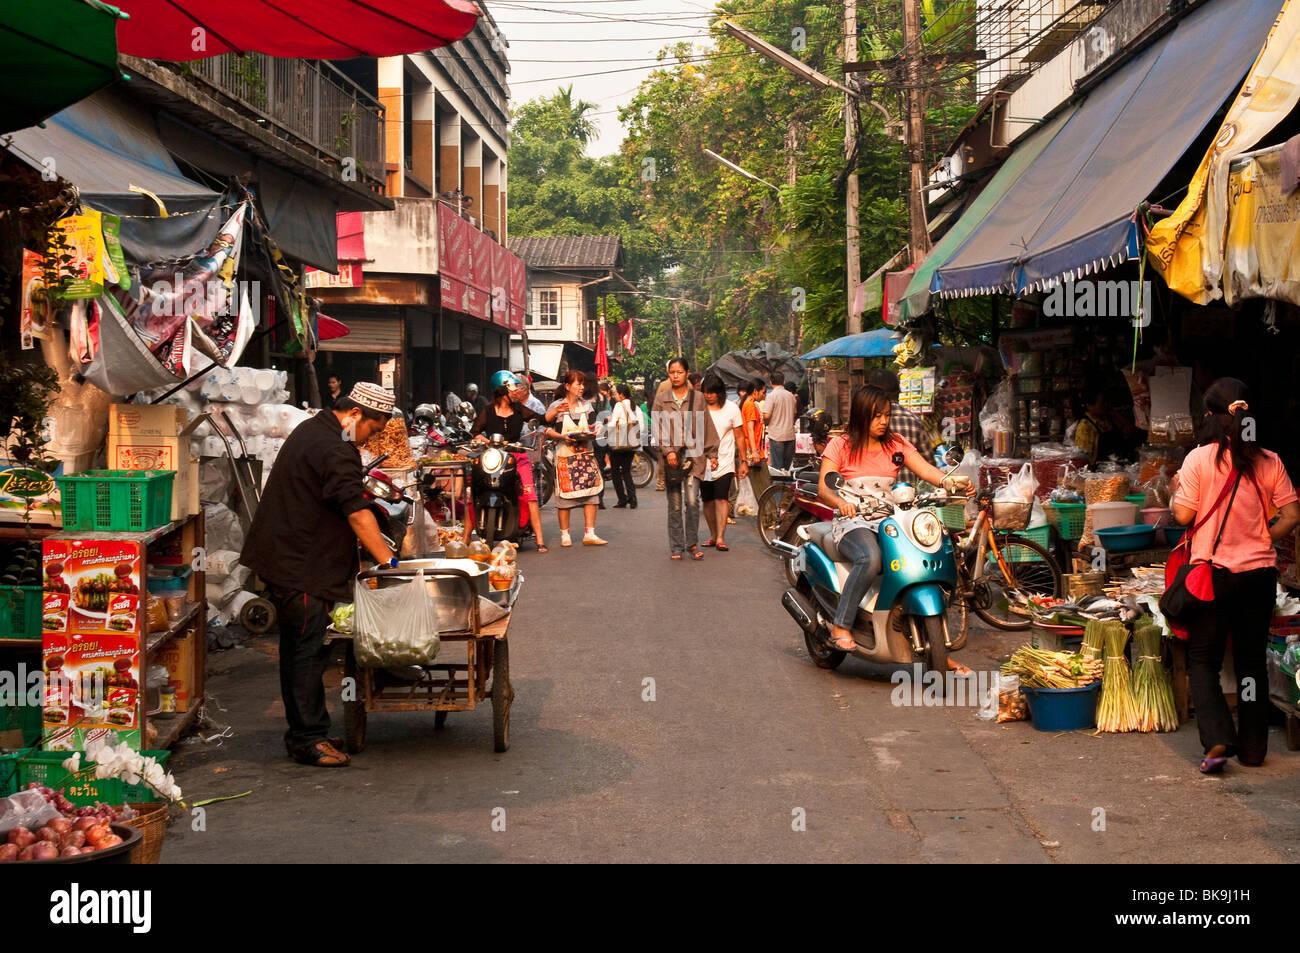 Pratu Chiang Mai Market vendors and shoppers; Chiang Mai, Thailand. - Stock Image